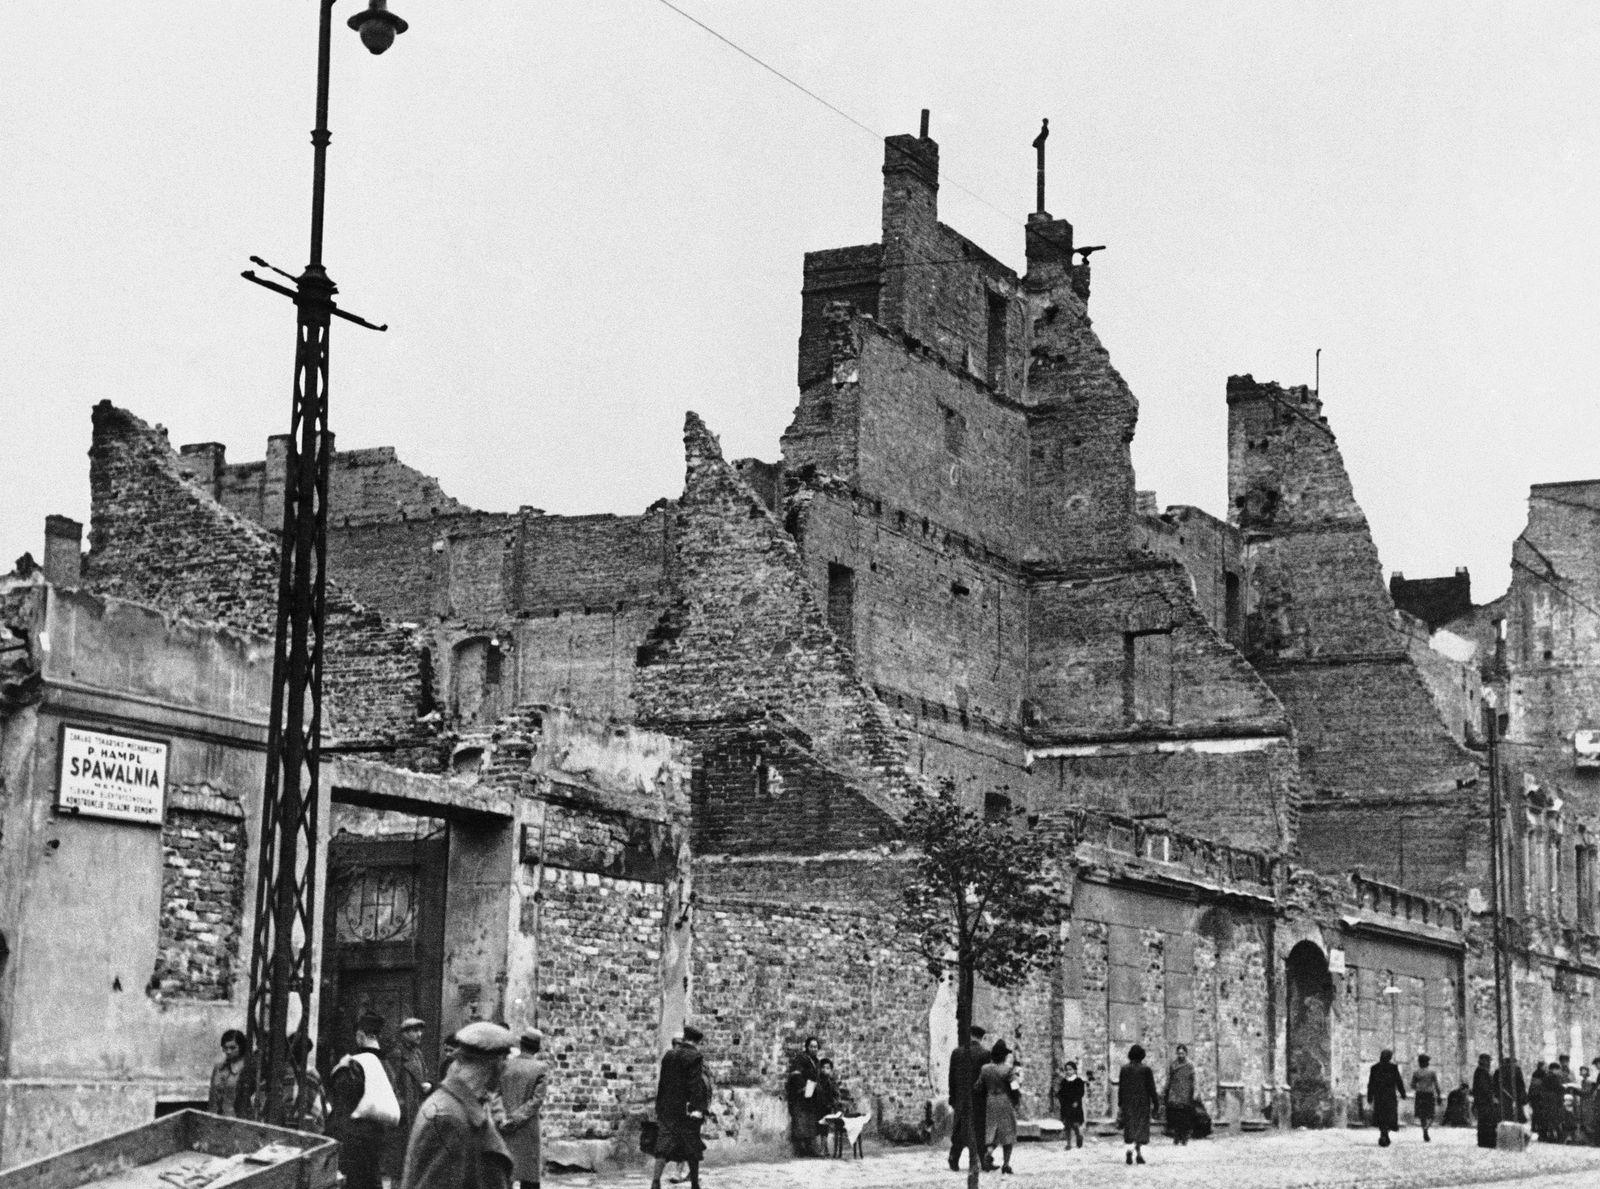 WWII Germany Invades Poland 1939